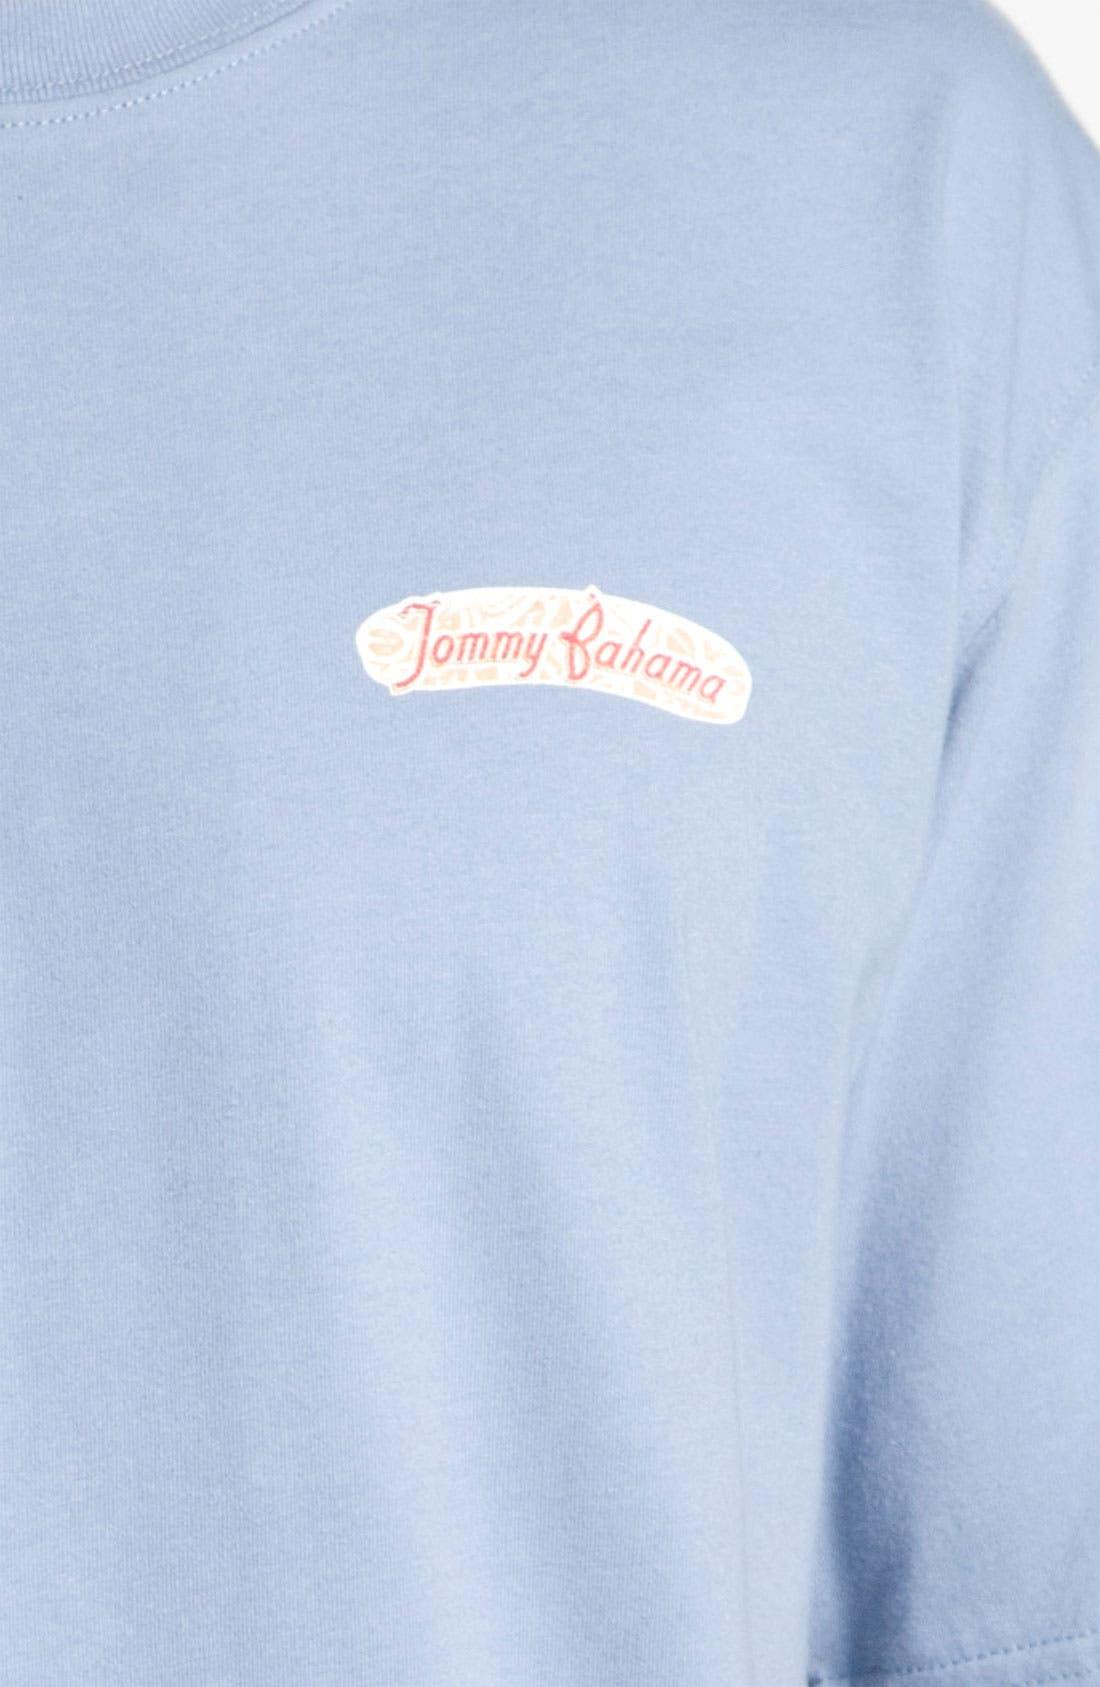 Alternate Image 3  - Tommy Bahama 'Sound Waves Brew' T-Shirt